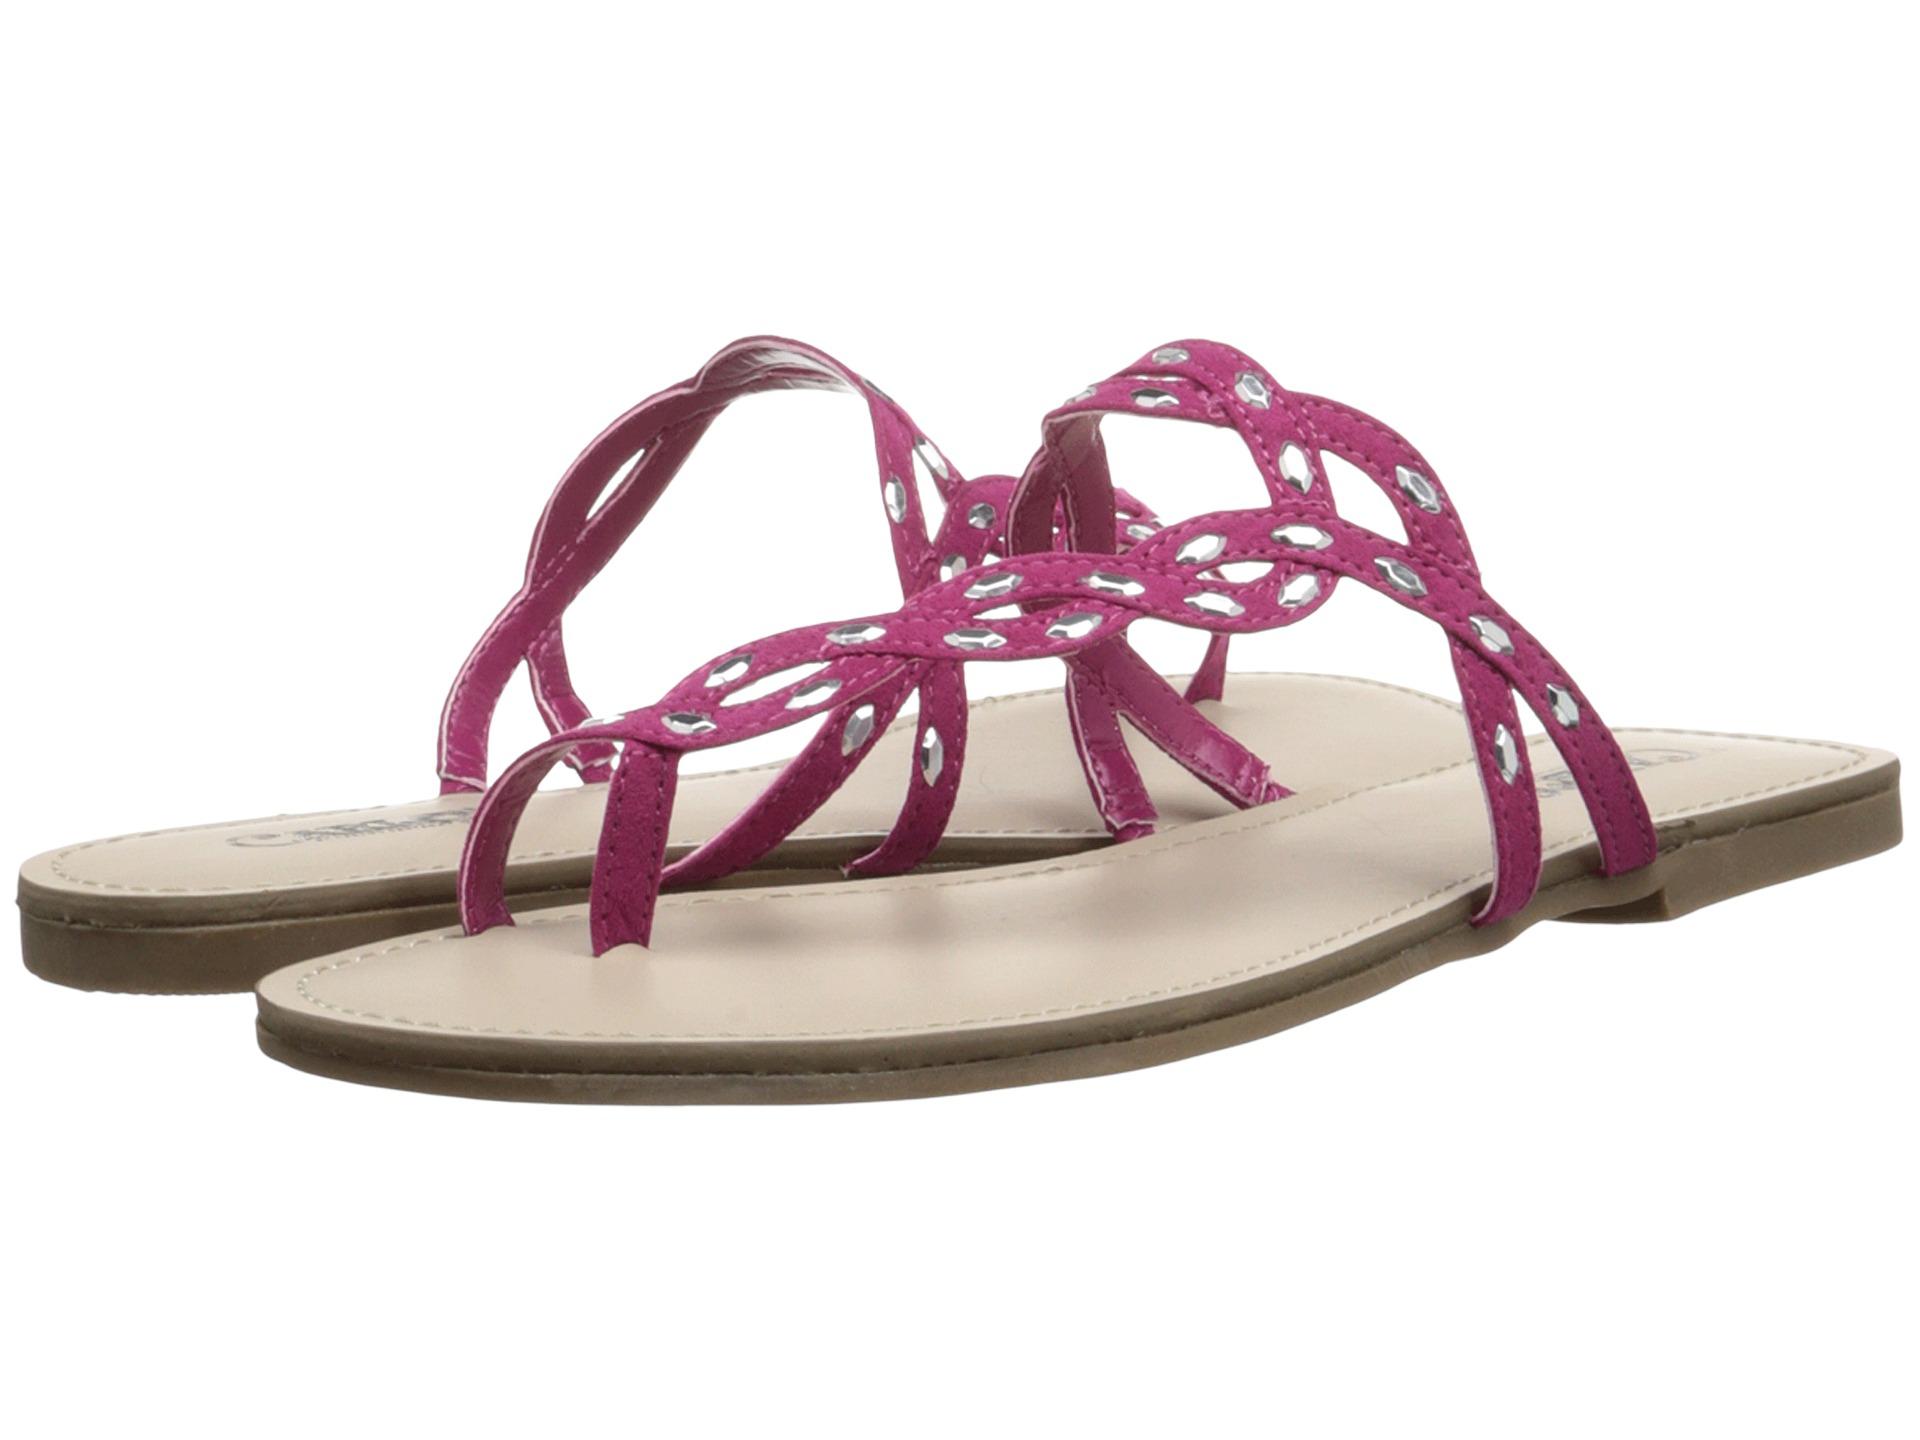 Womens Sandals CARLOS by Carlos Santana Selena Raspberry